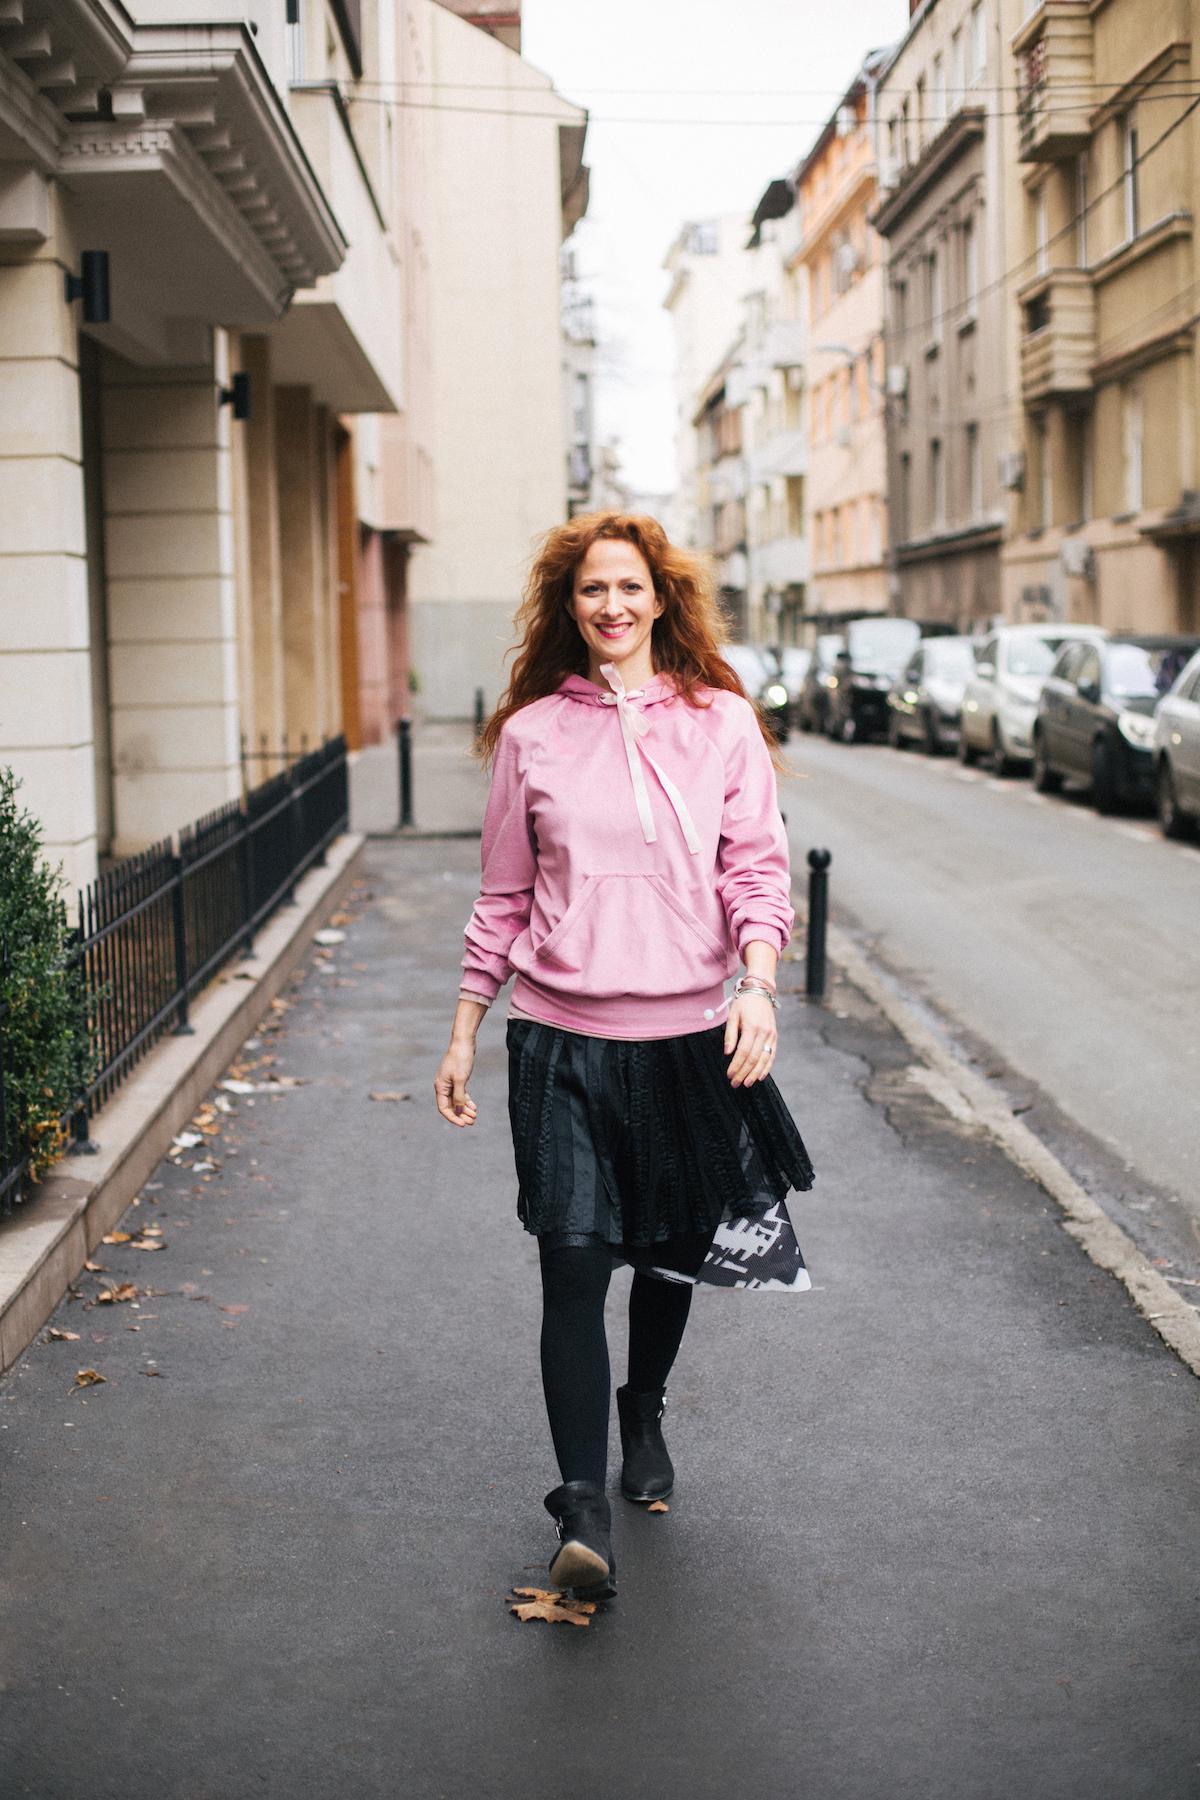 Beograd moda Nika Veger Beutyfullblog by JT__1380 a